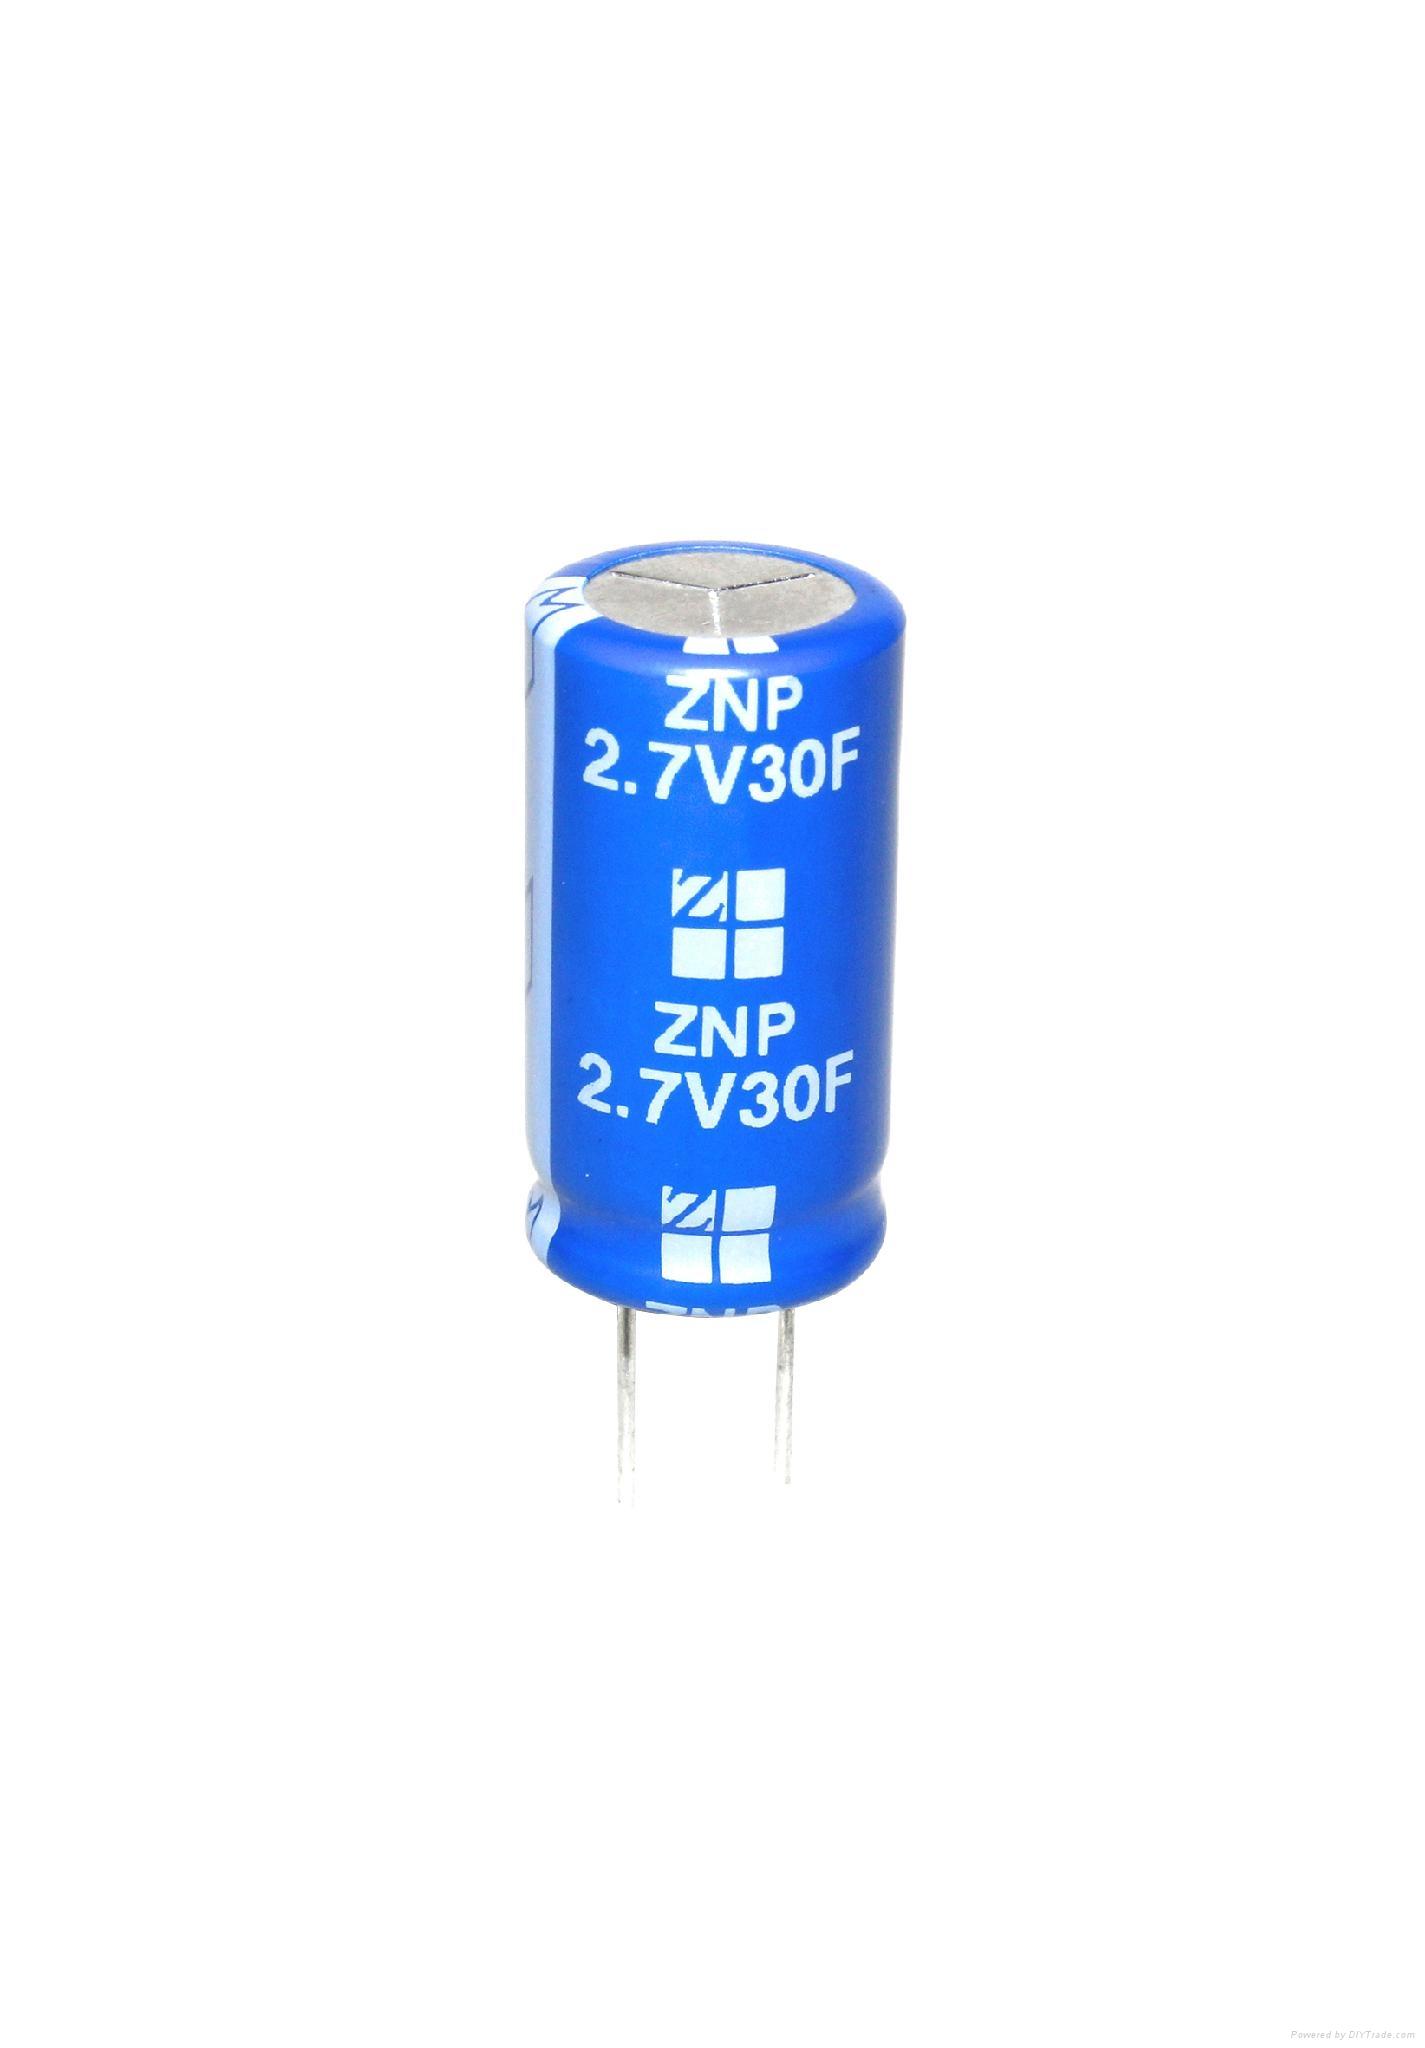 Ultra capacitor supercapacitor 2.7V 30F 5